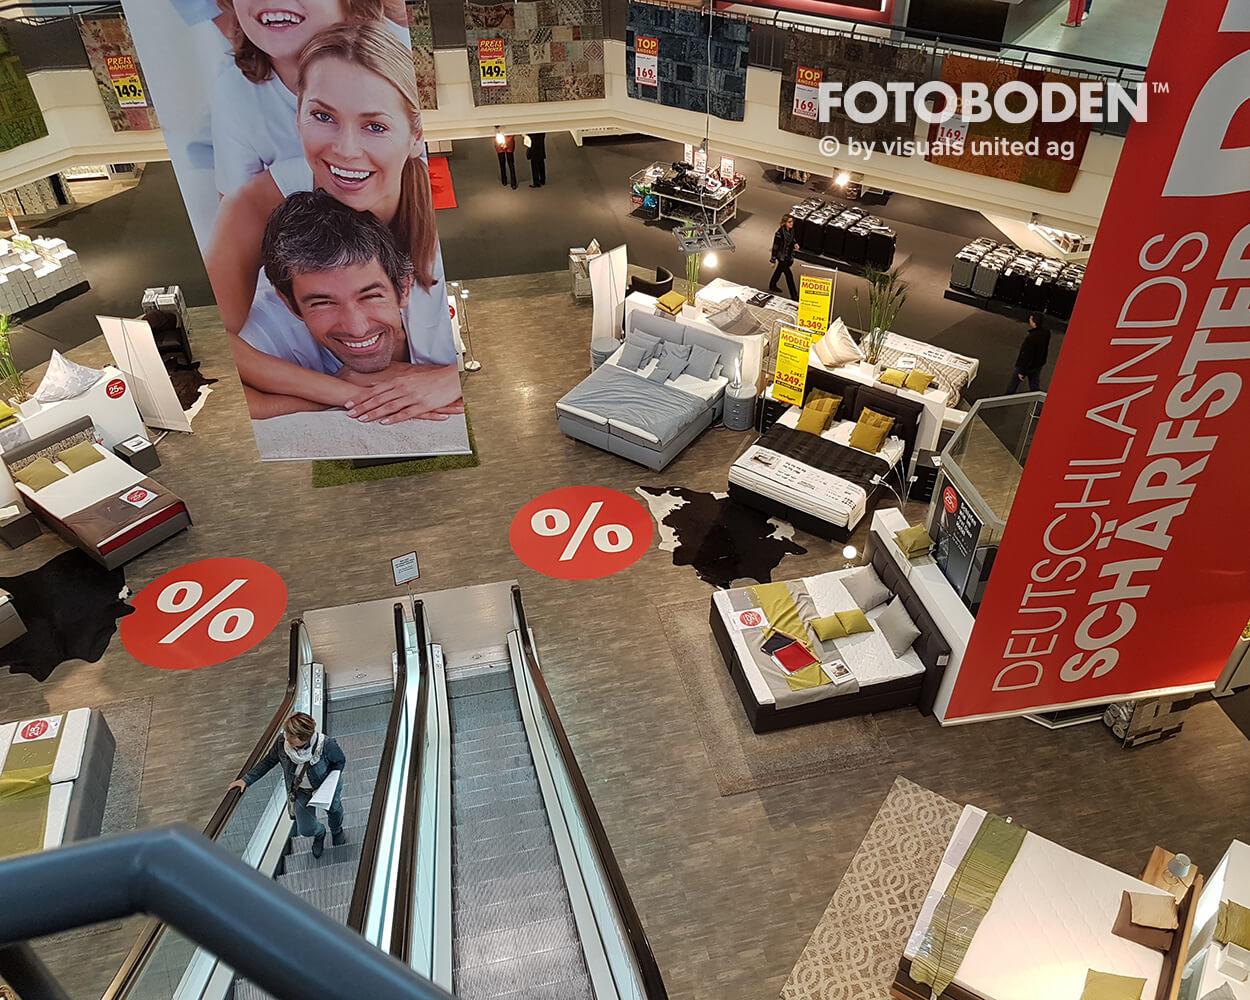 VMZB Fotoboden Flooring Fußboden Bodengestaltung Floorminder Bodendruck Werbung Fußbodenwerbung Bodenwerbung Merchandising Advertising1